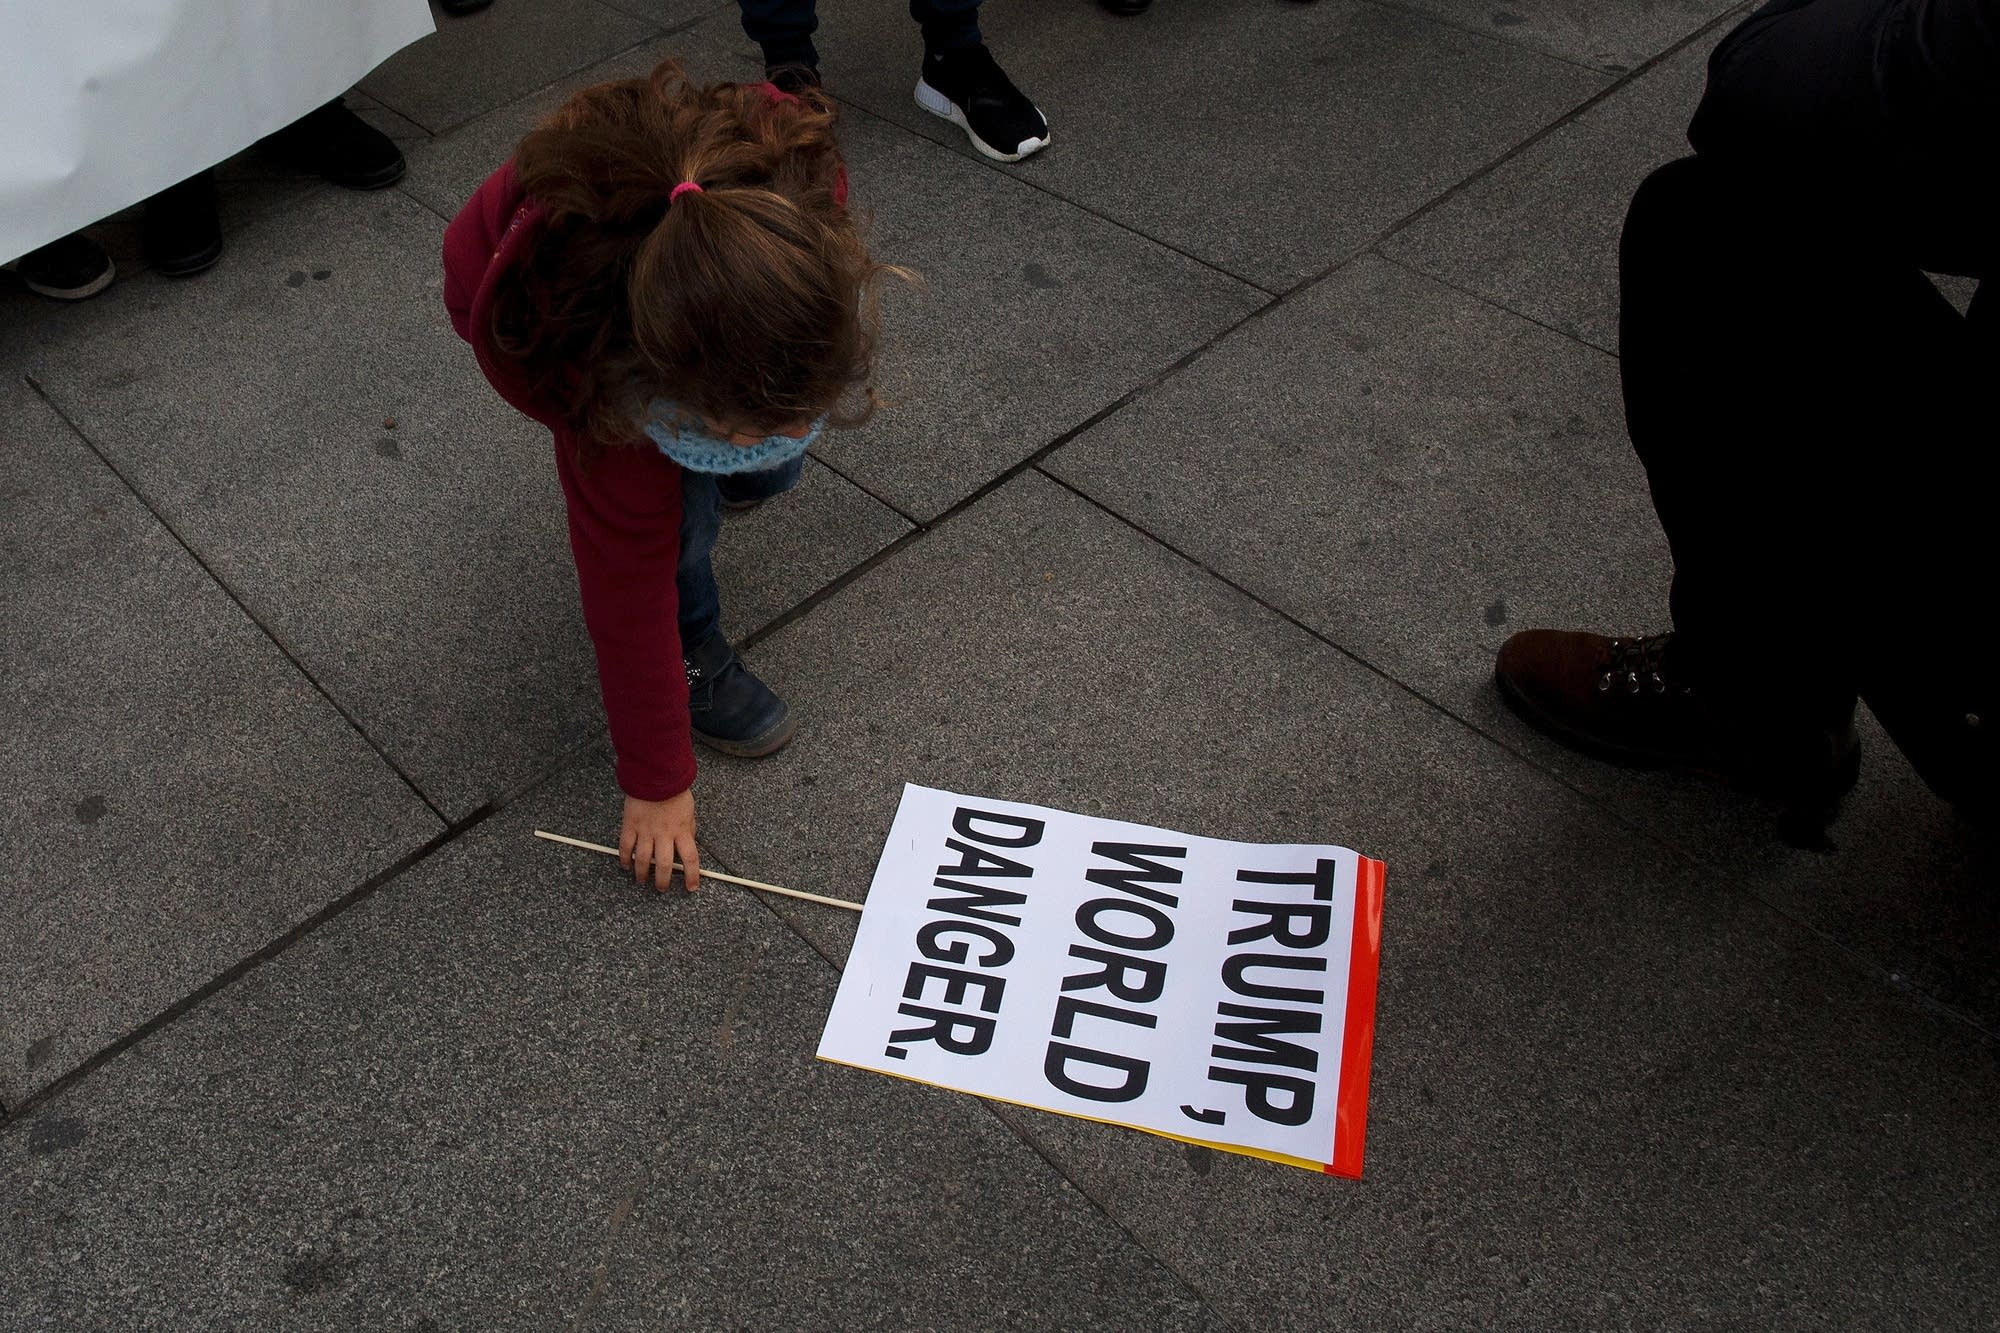 Madrid, Spain: A girl picks up a placard.